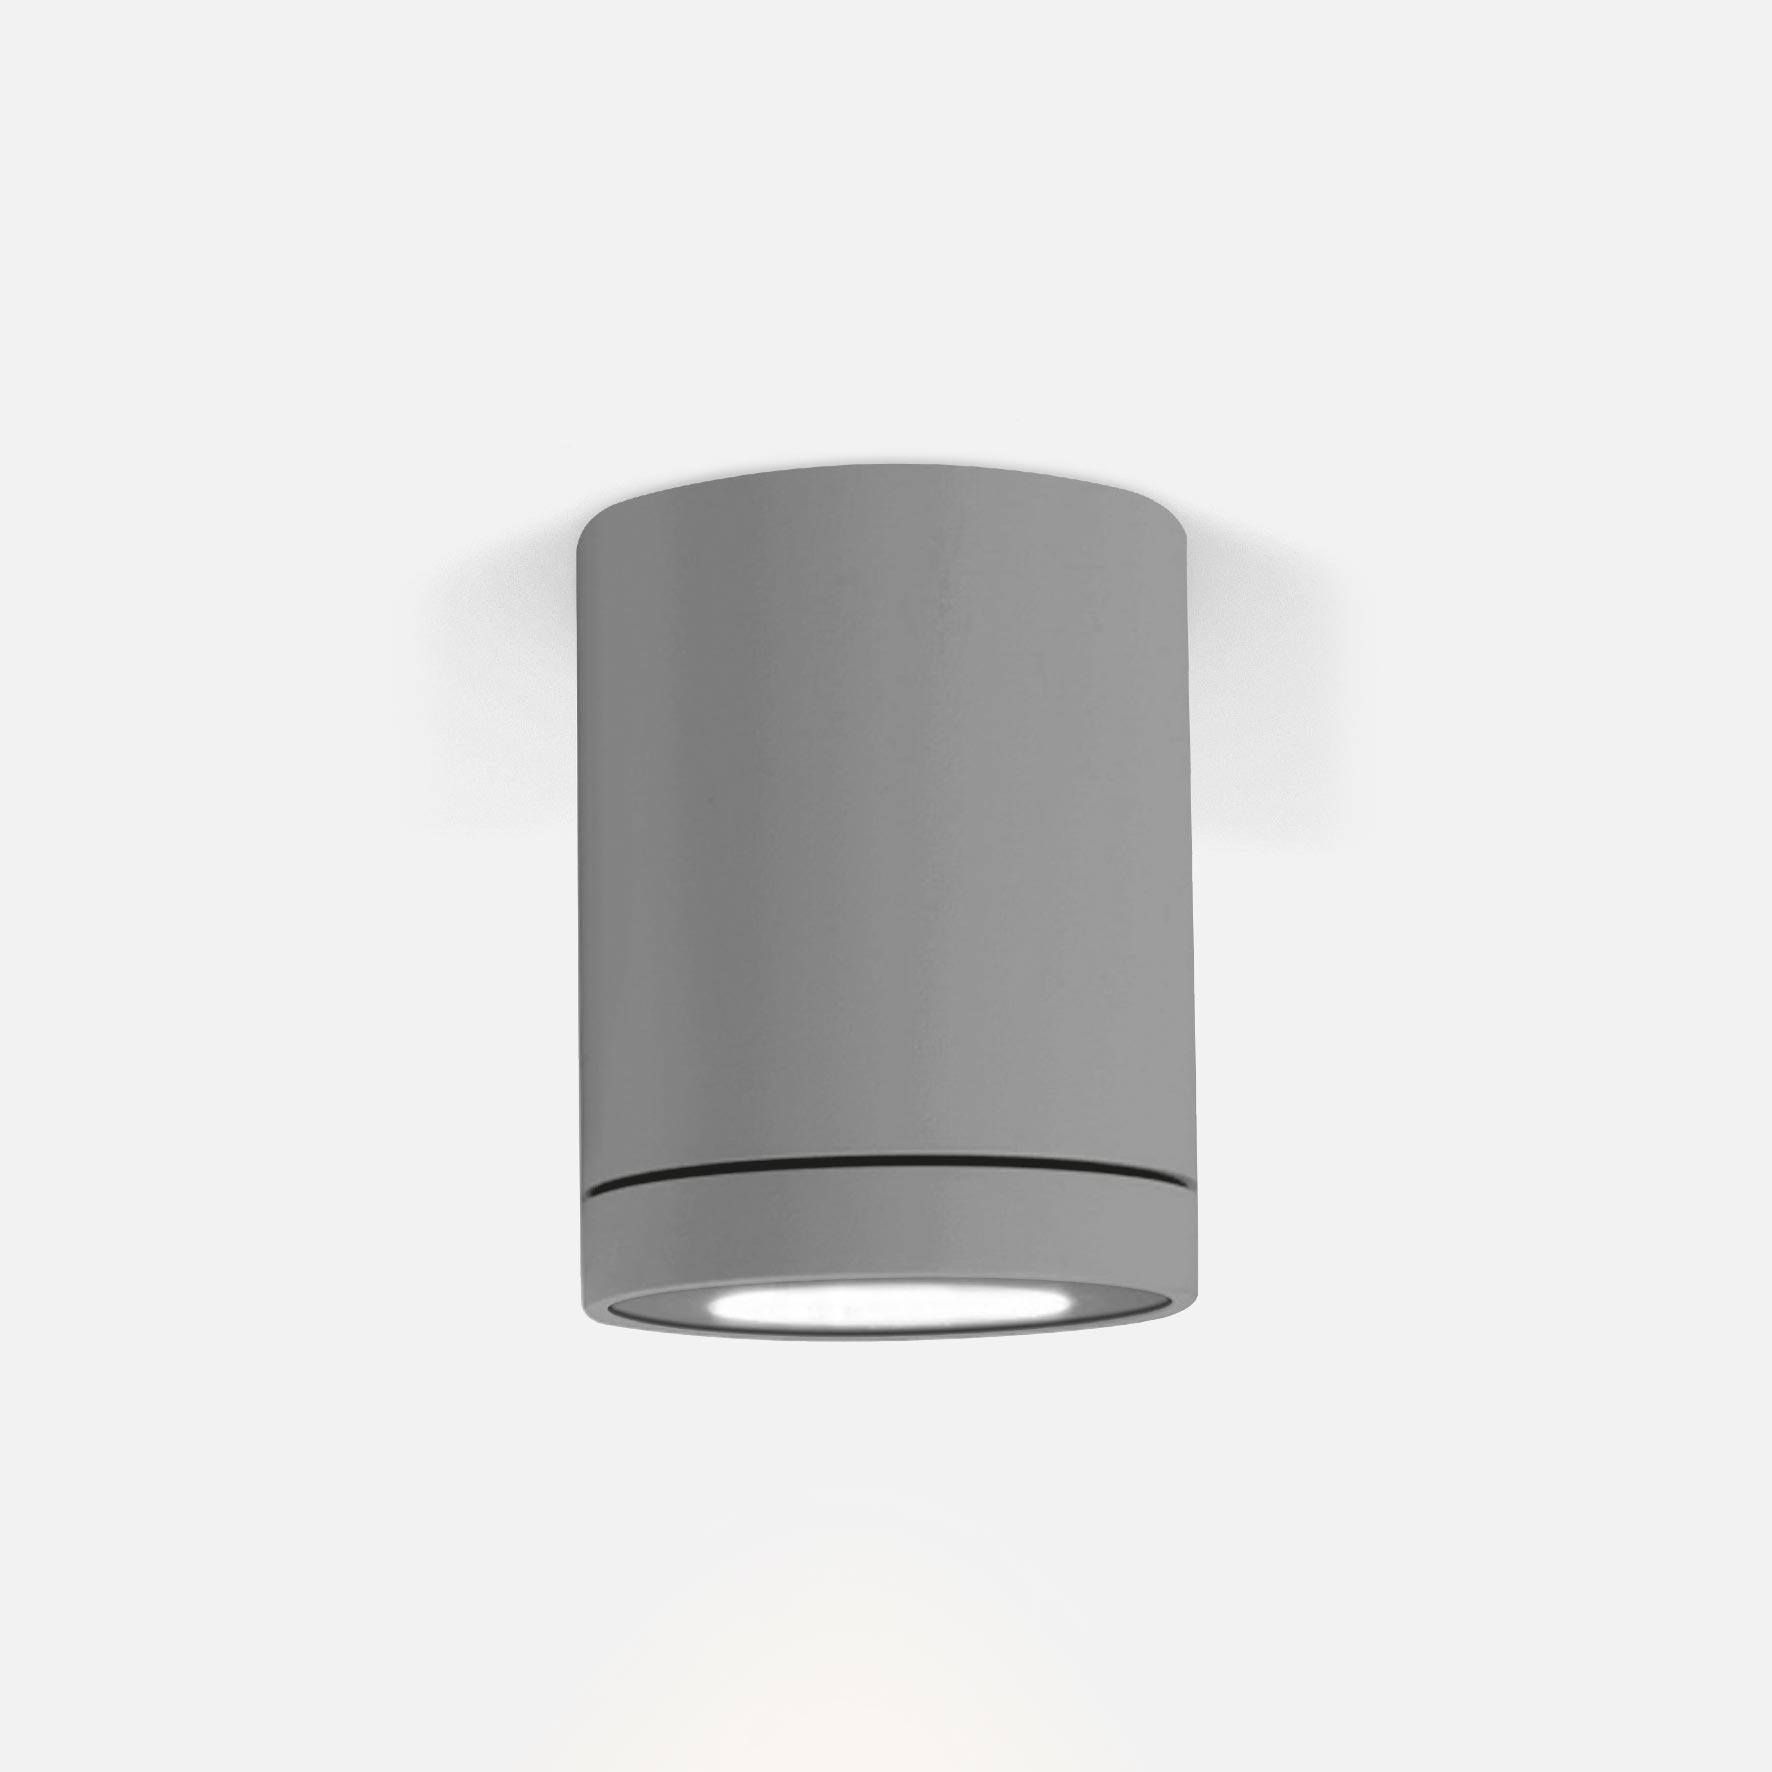 Tube ceiling 1.0 led black texture